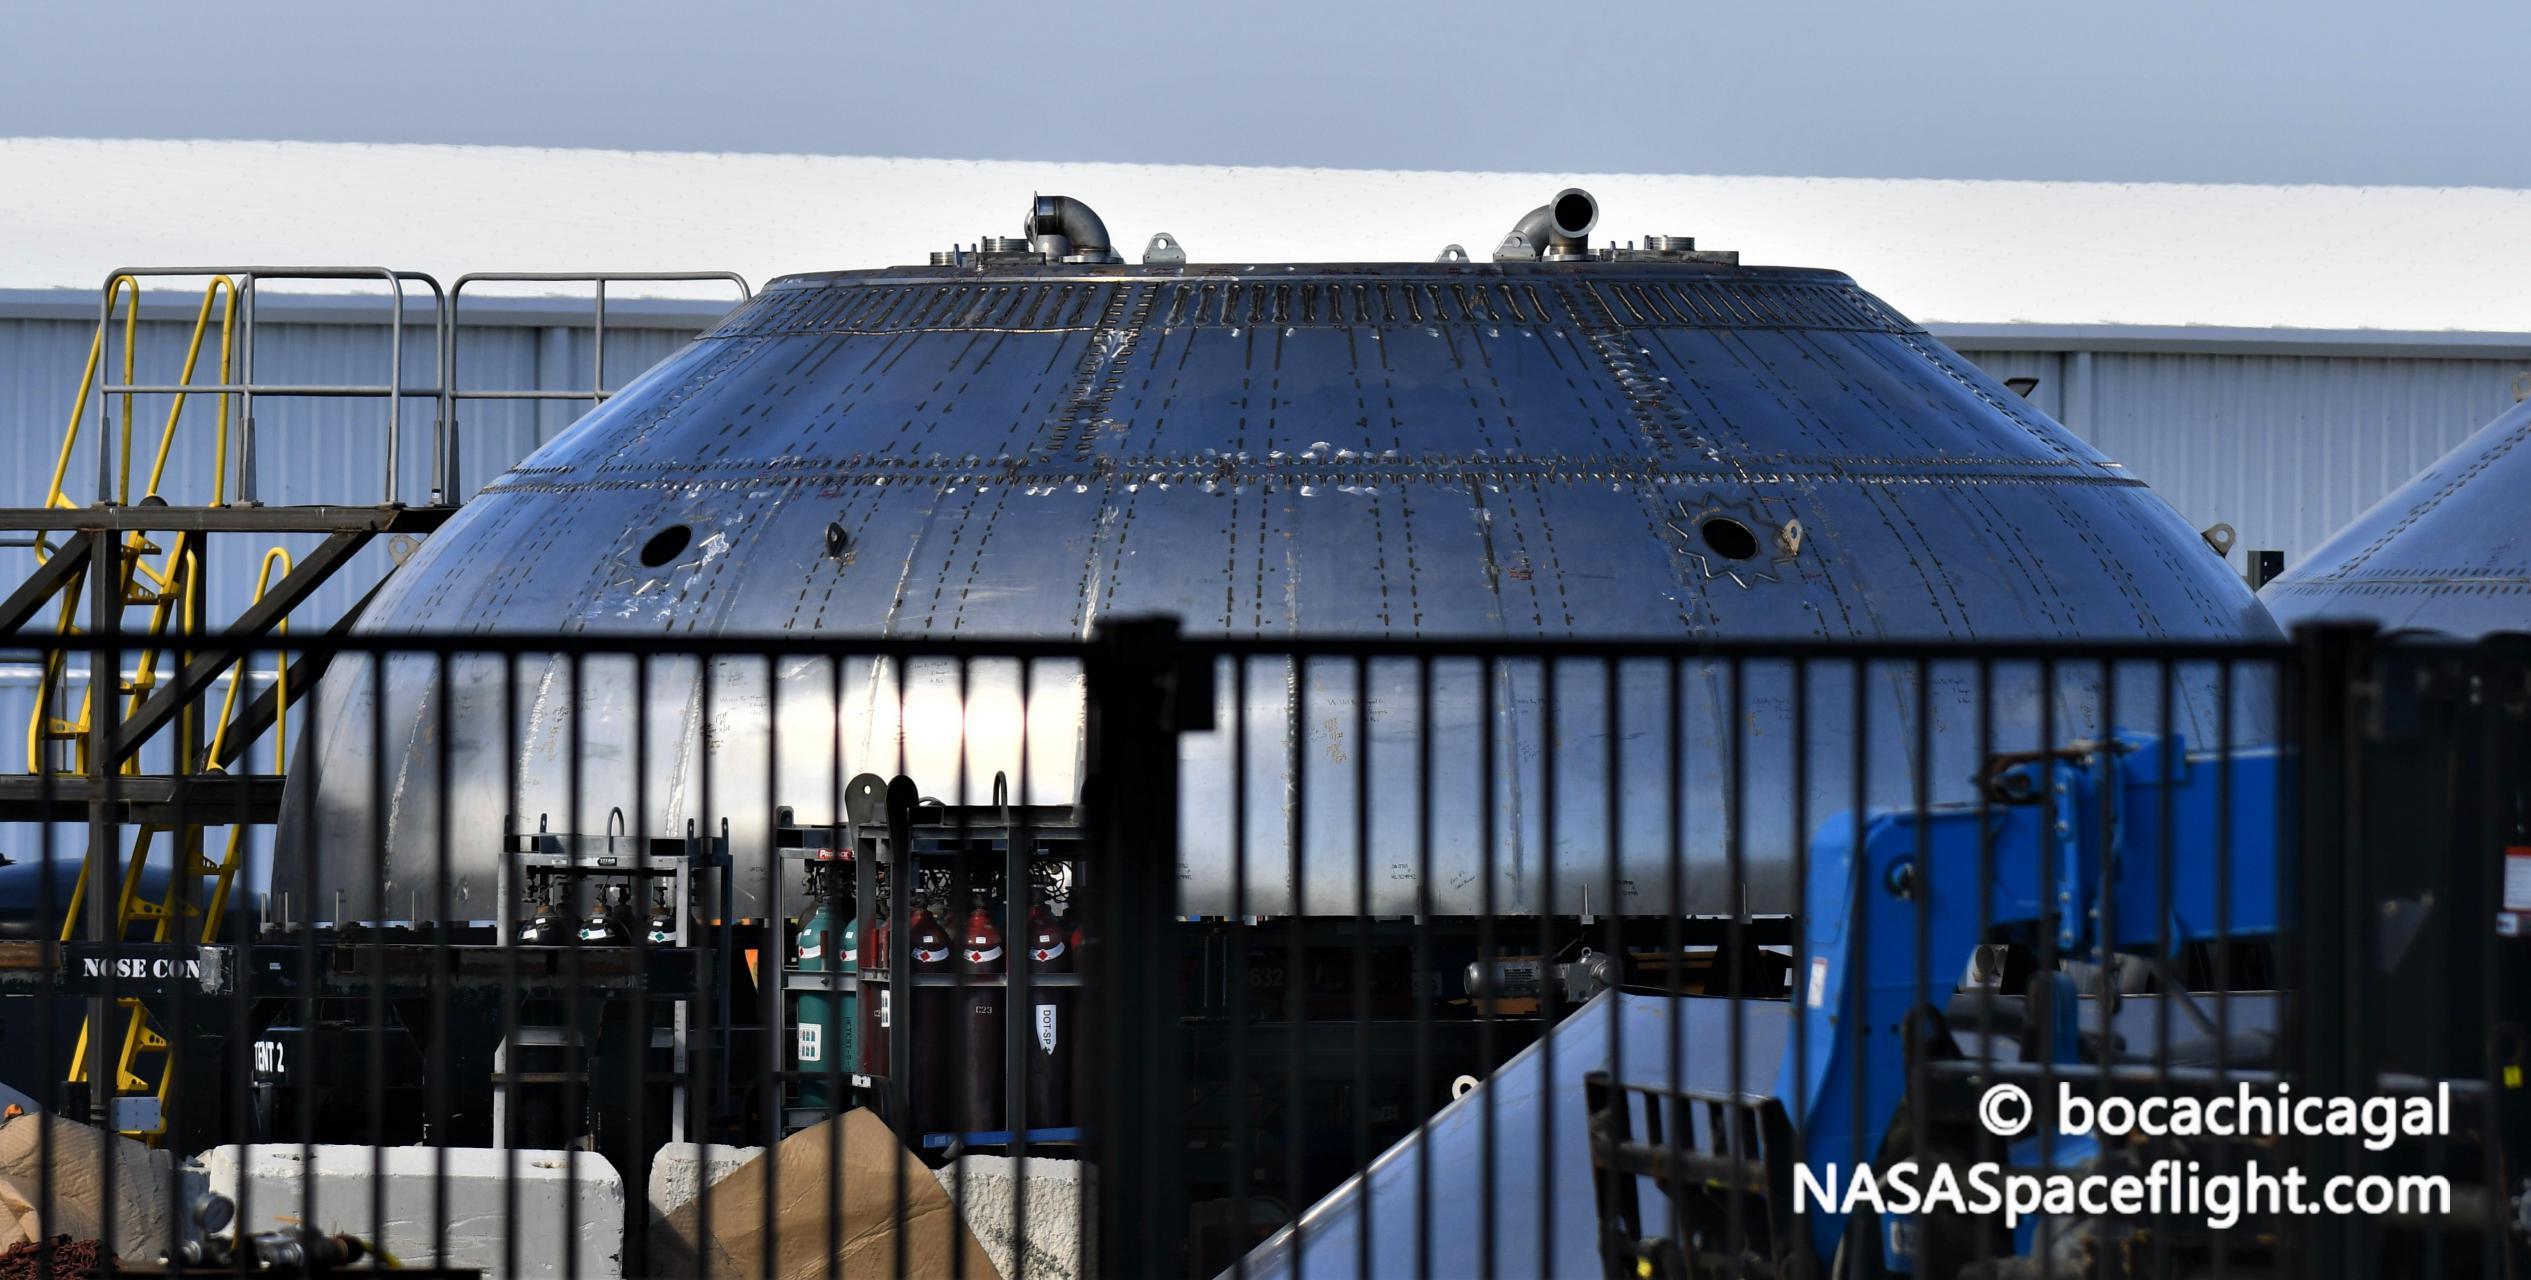 Starship Boca Chica 013021 (NASASpaceflight – bocachicagal) BN1 thrust dome 1 crop (c)